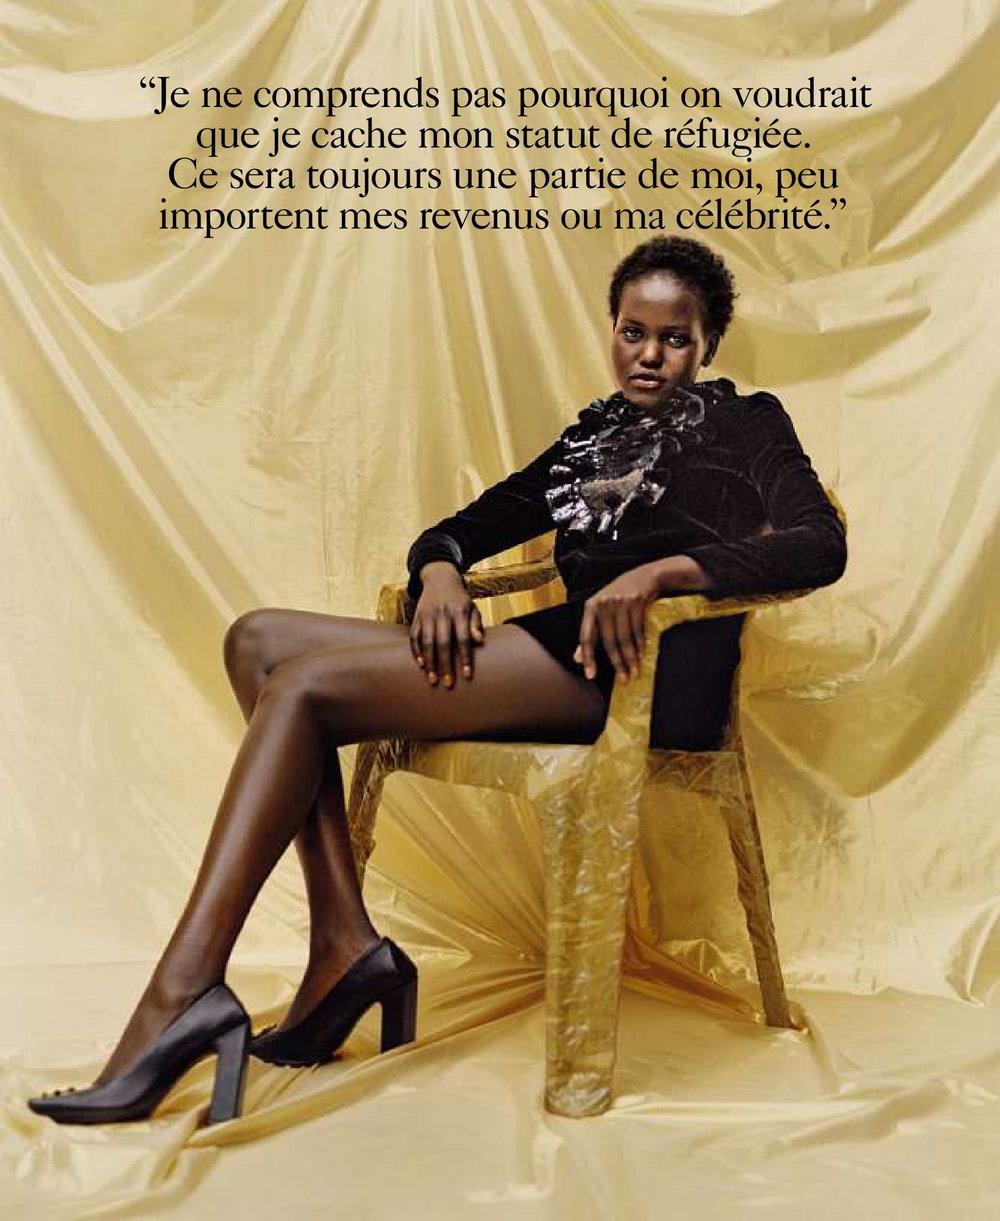 Adut Akech by Tyler Mitchell for M Le Monde Du Mode 2-15-19 (1).jpg